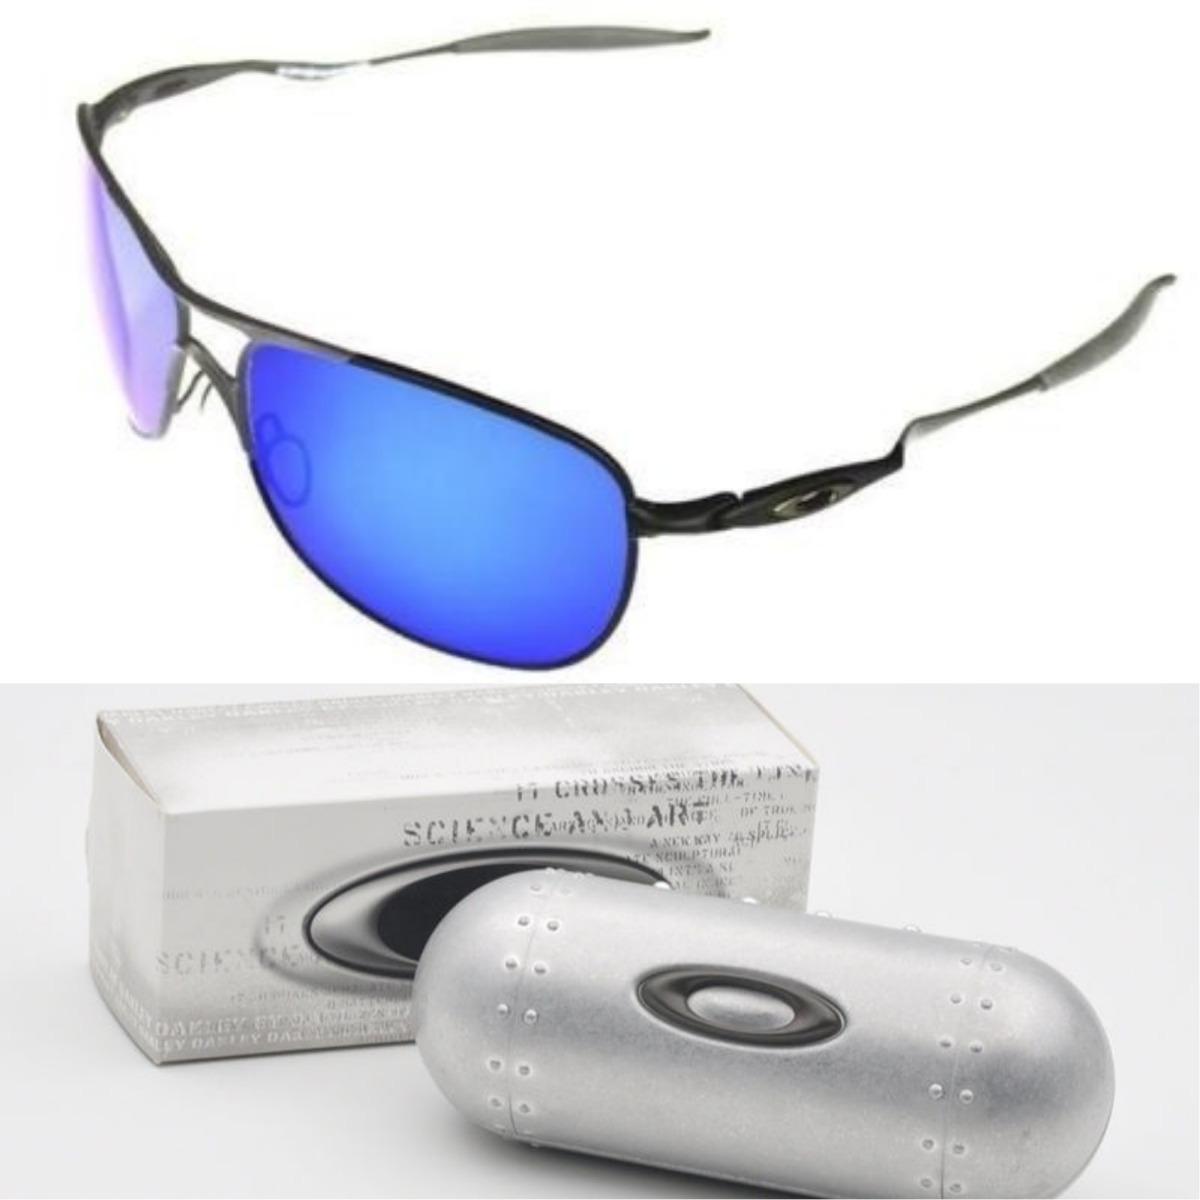 oculos oakley crosshair polarizado diversas cores masculino. Carregando  zoom. 34f7067a39